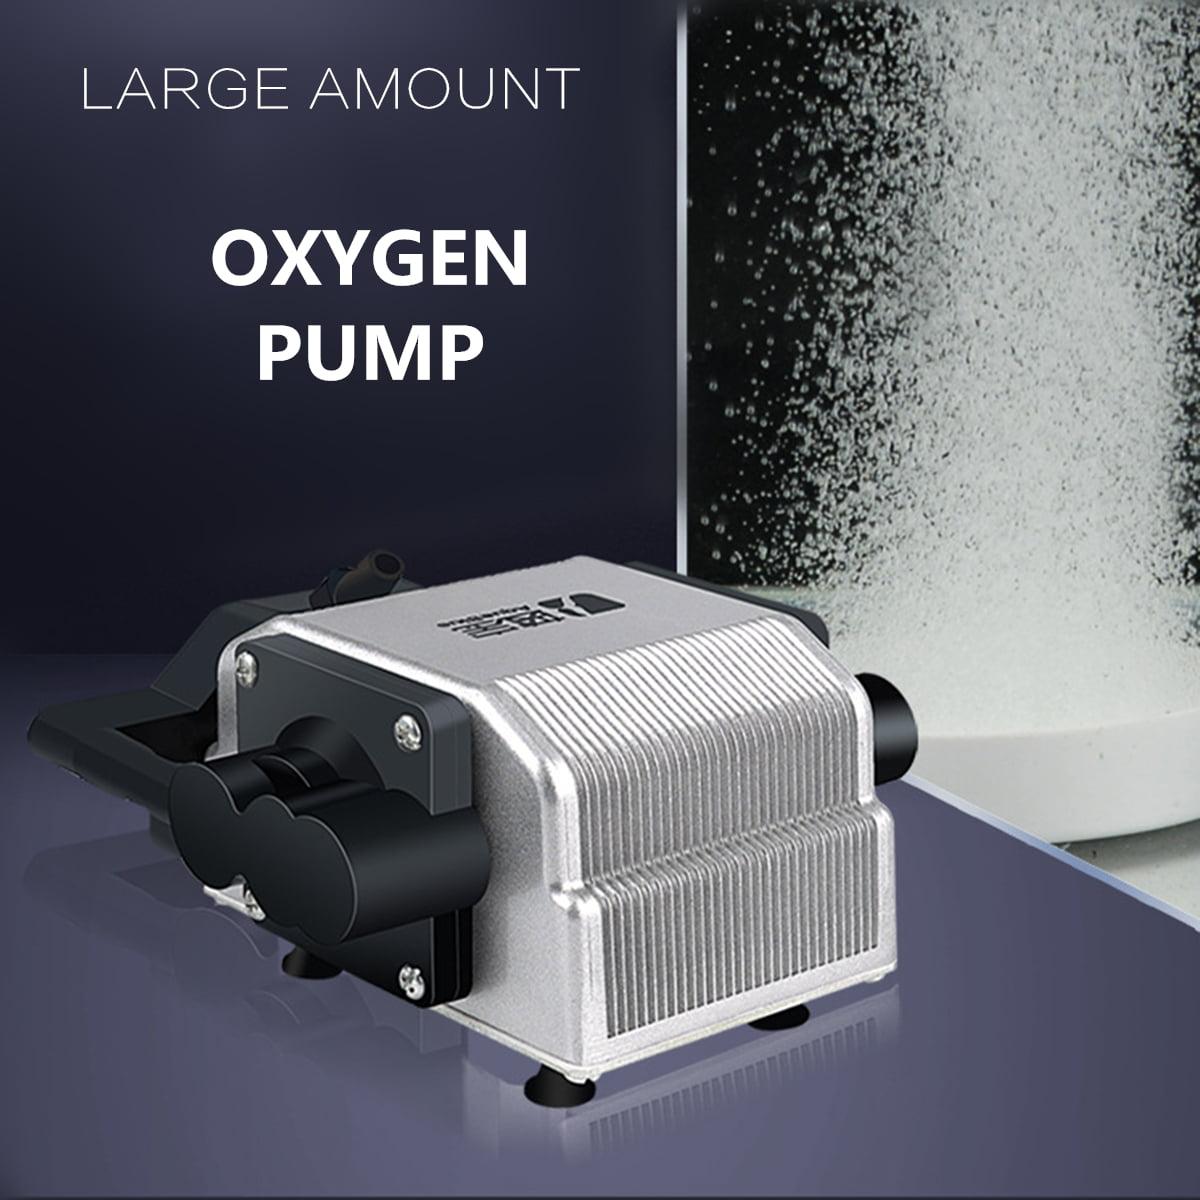 Moaere Ultra Silent High Energy Saving Oxygen Air Pump Quietest Aquarium Aerator Pump for Fish Tank